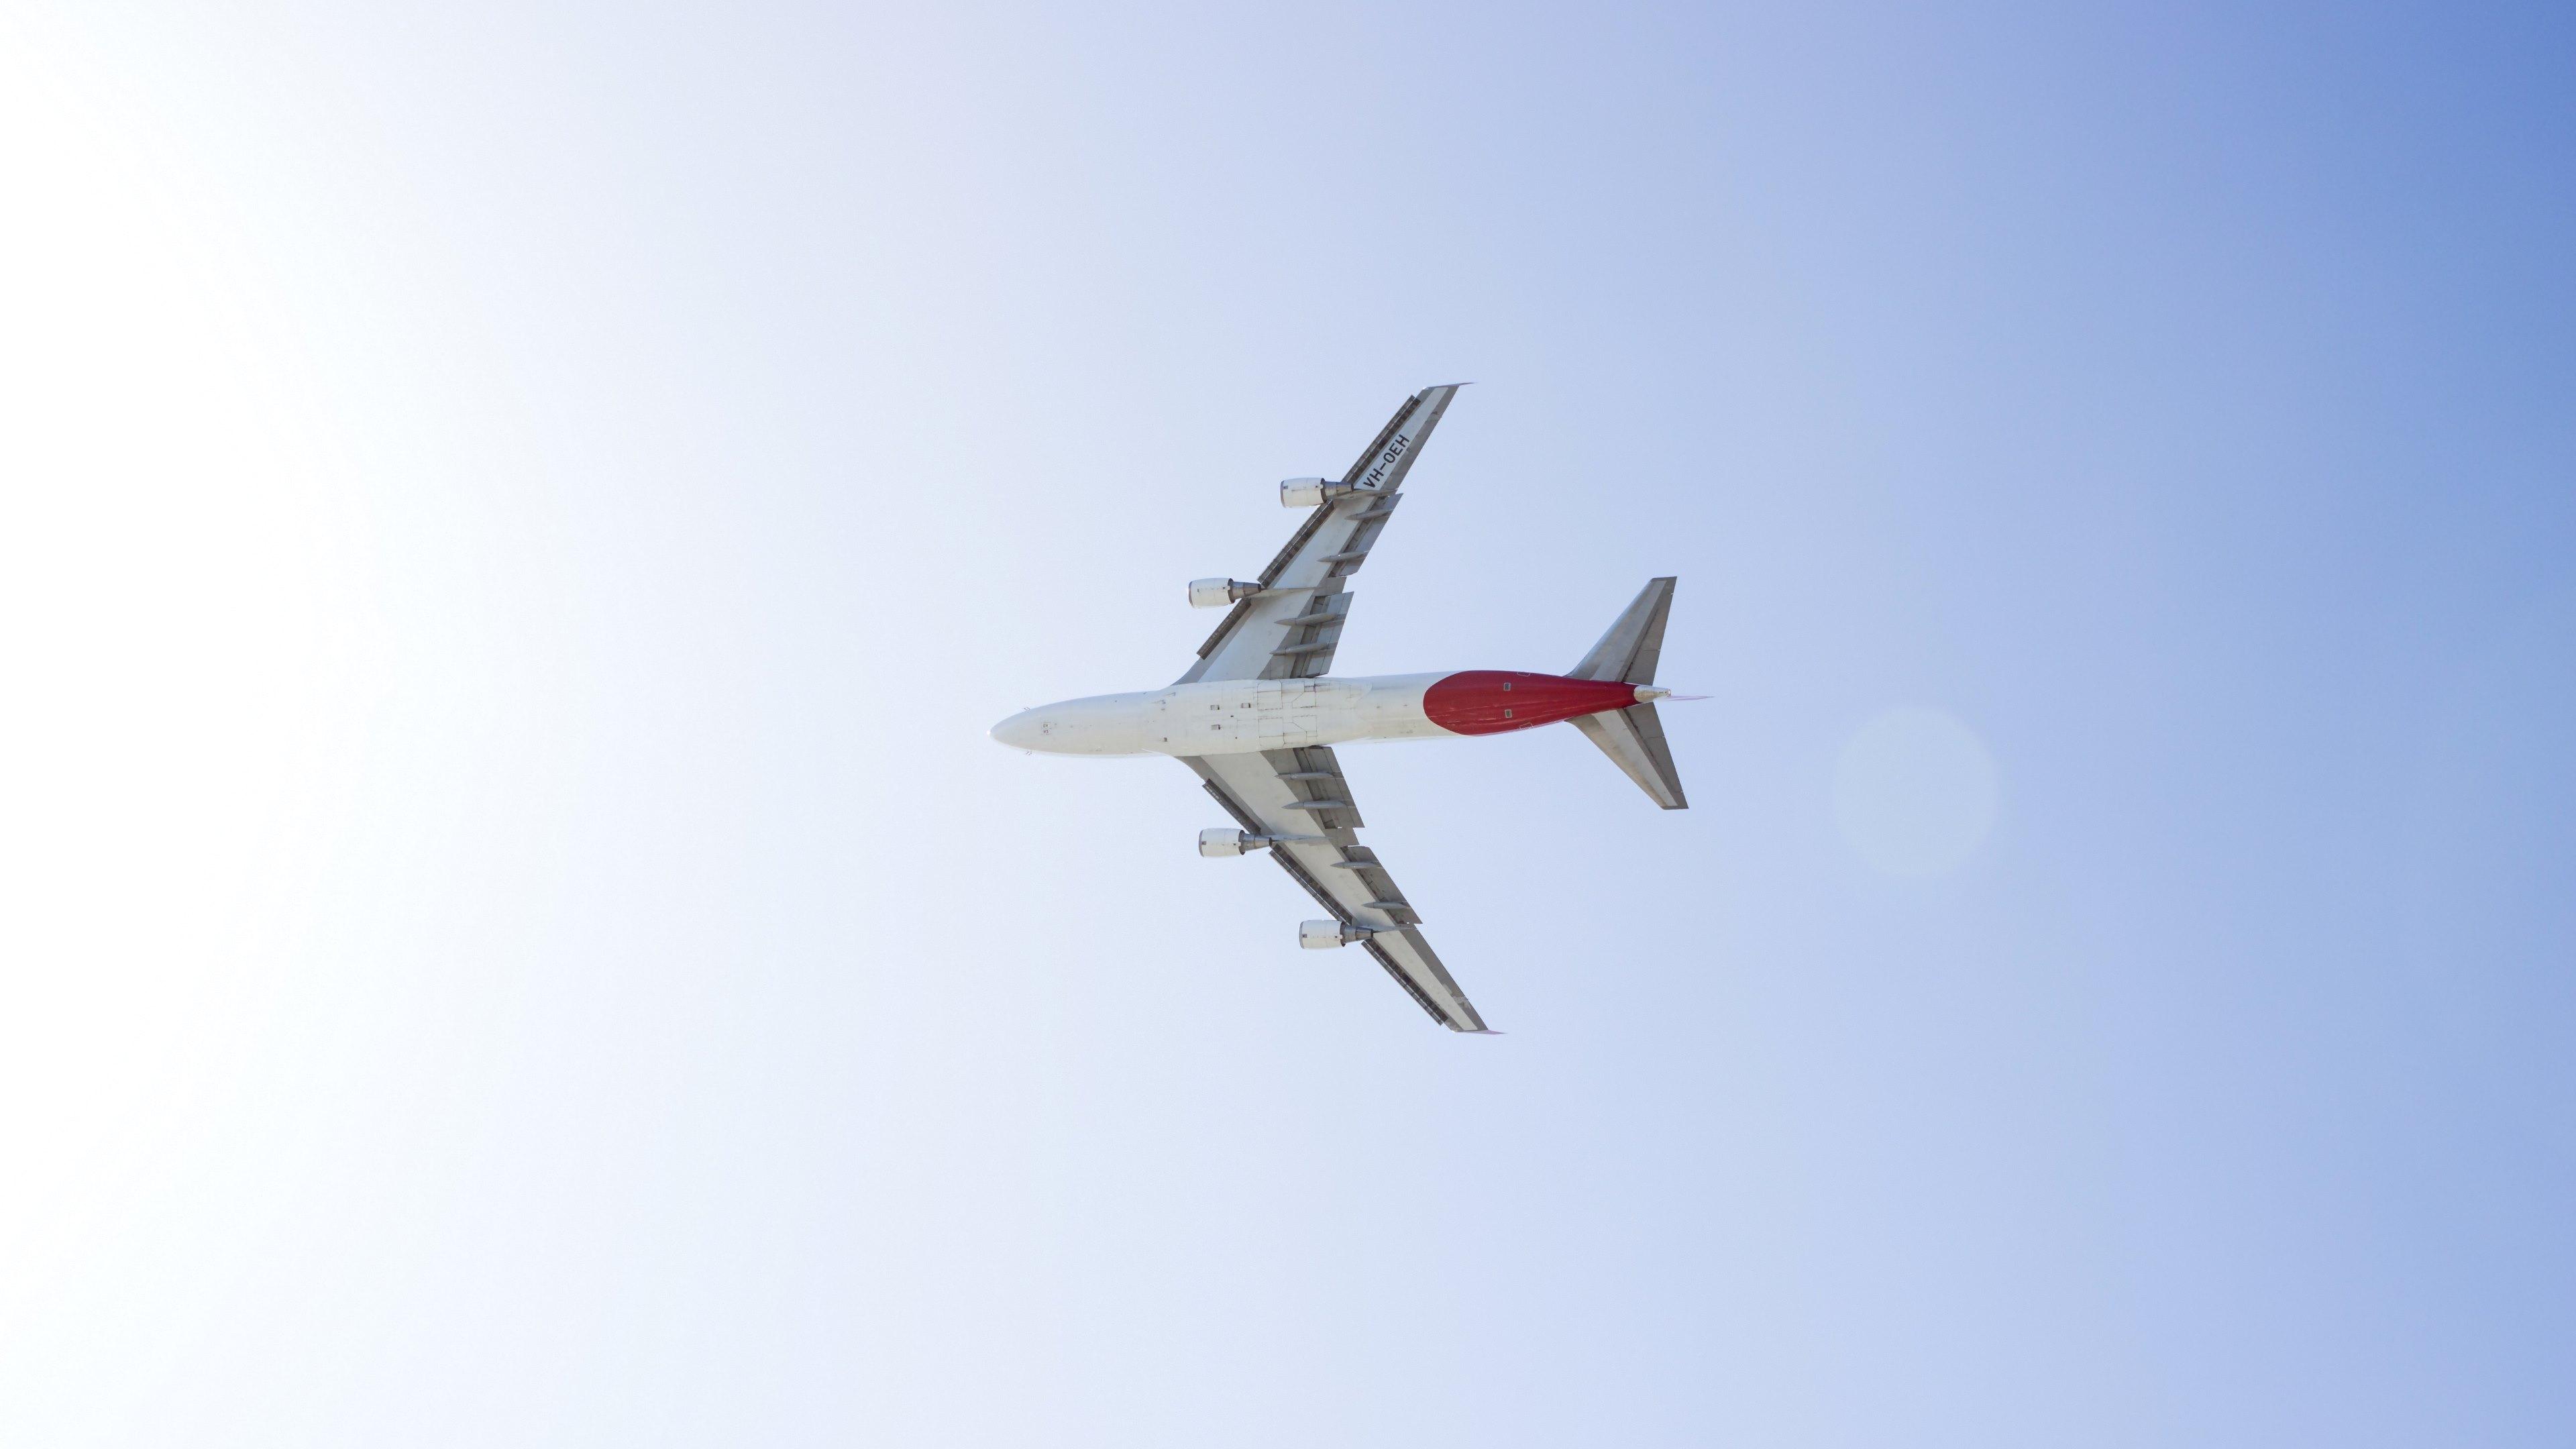 Airplane flying, avion, down, from below, down plane, flight, flight, flying, passengers, wings, lower